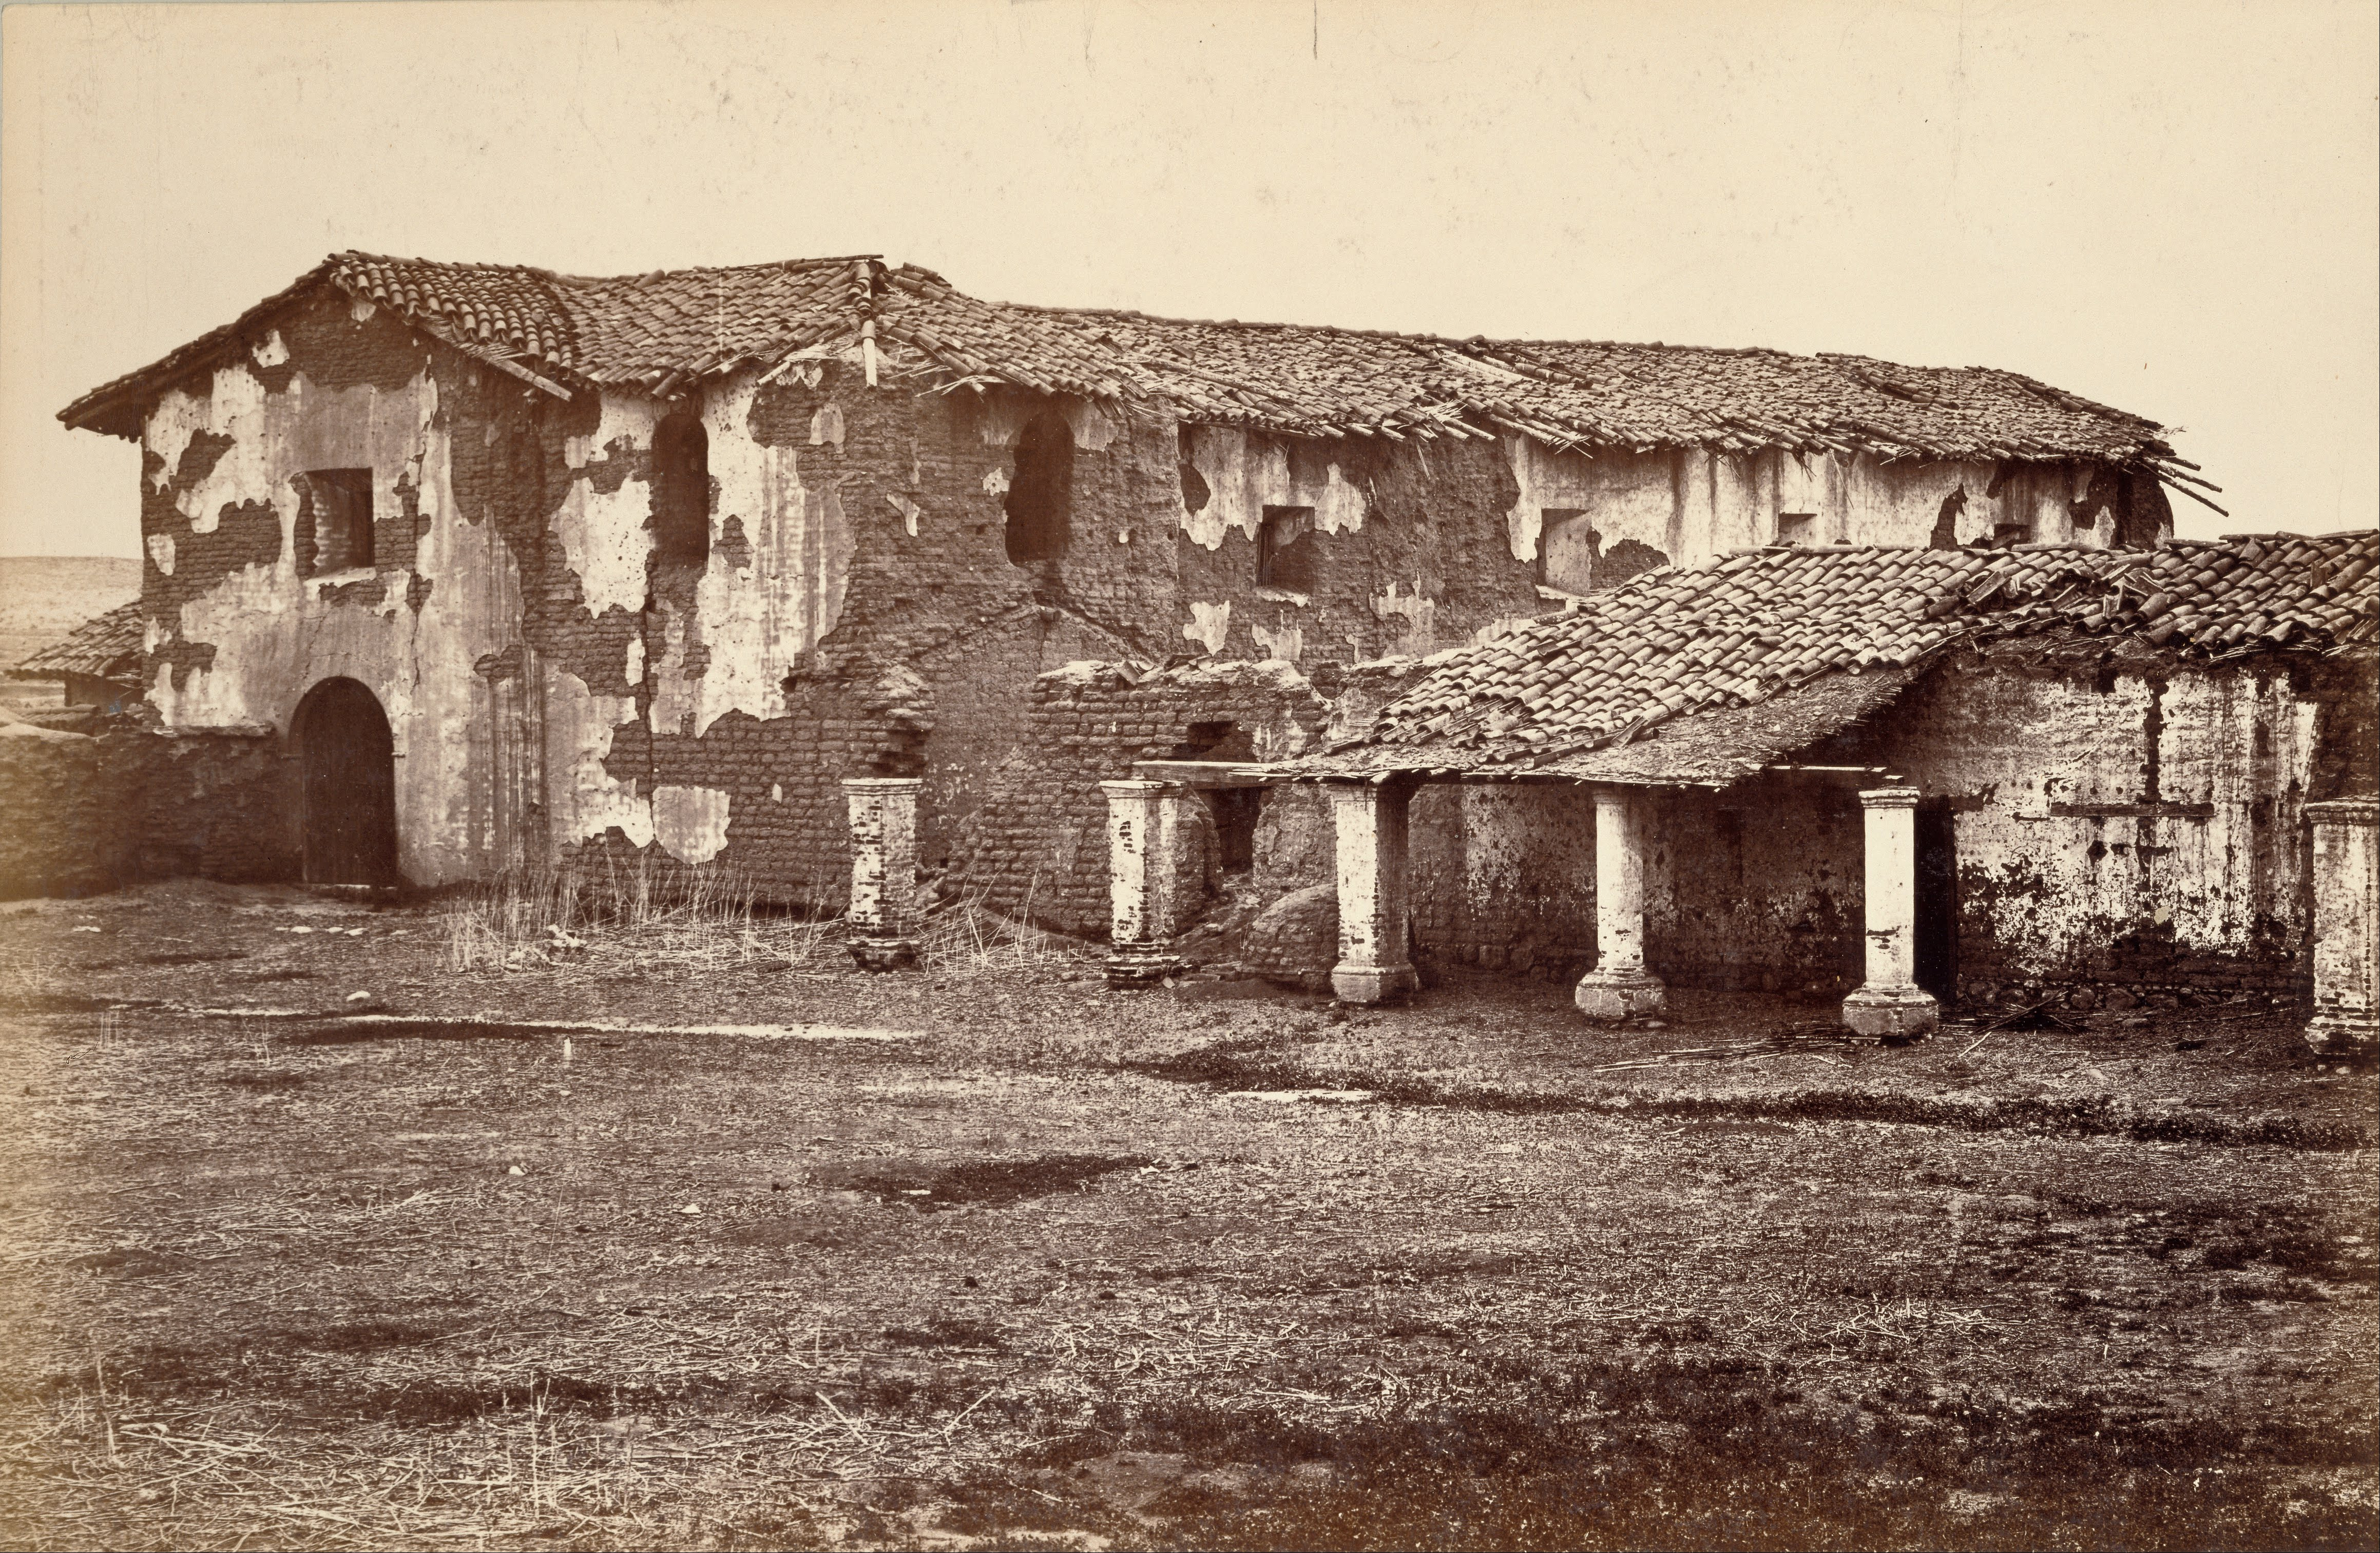 Mission San Fernando Rey de España - Wikipedia